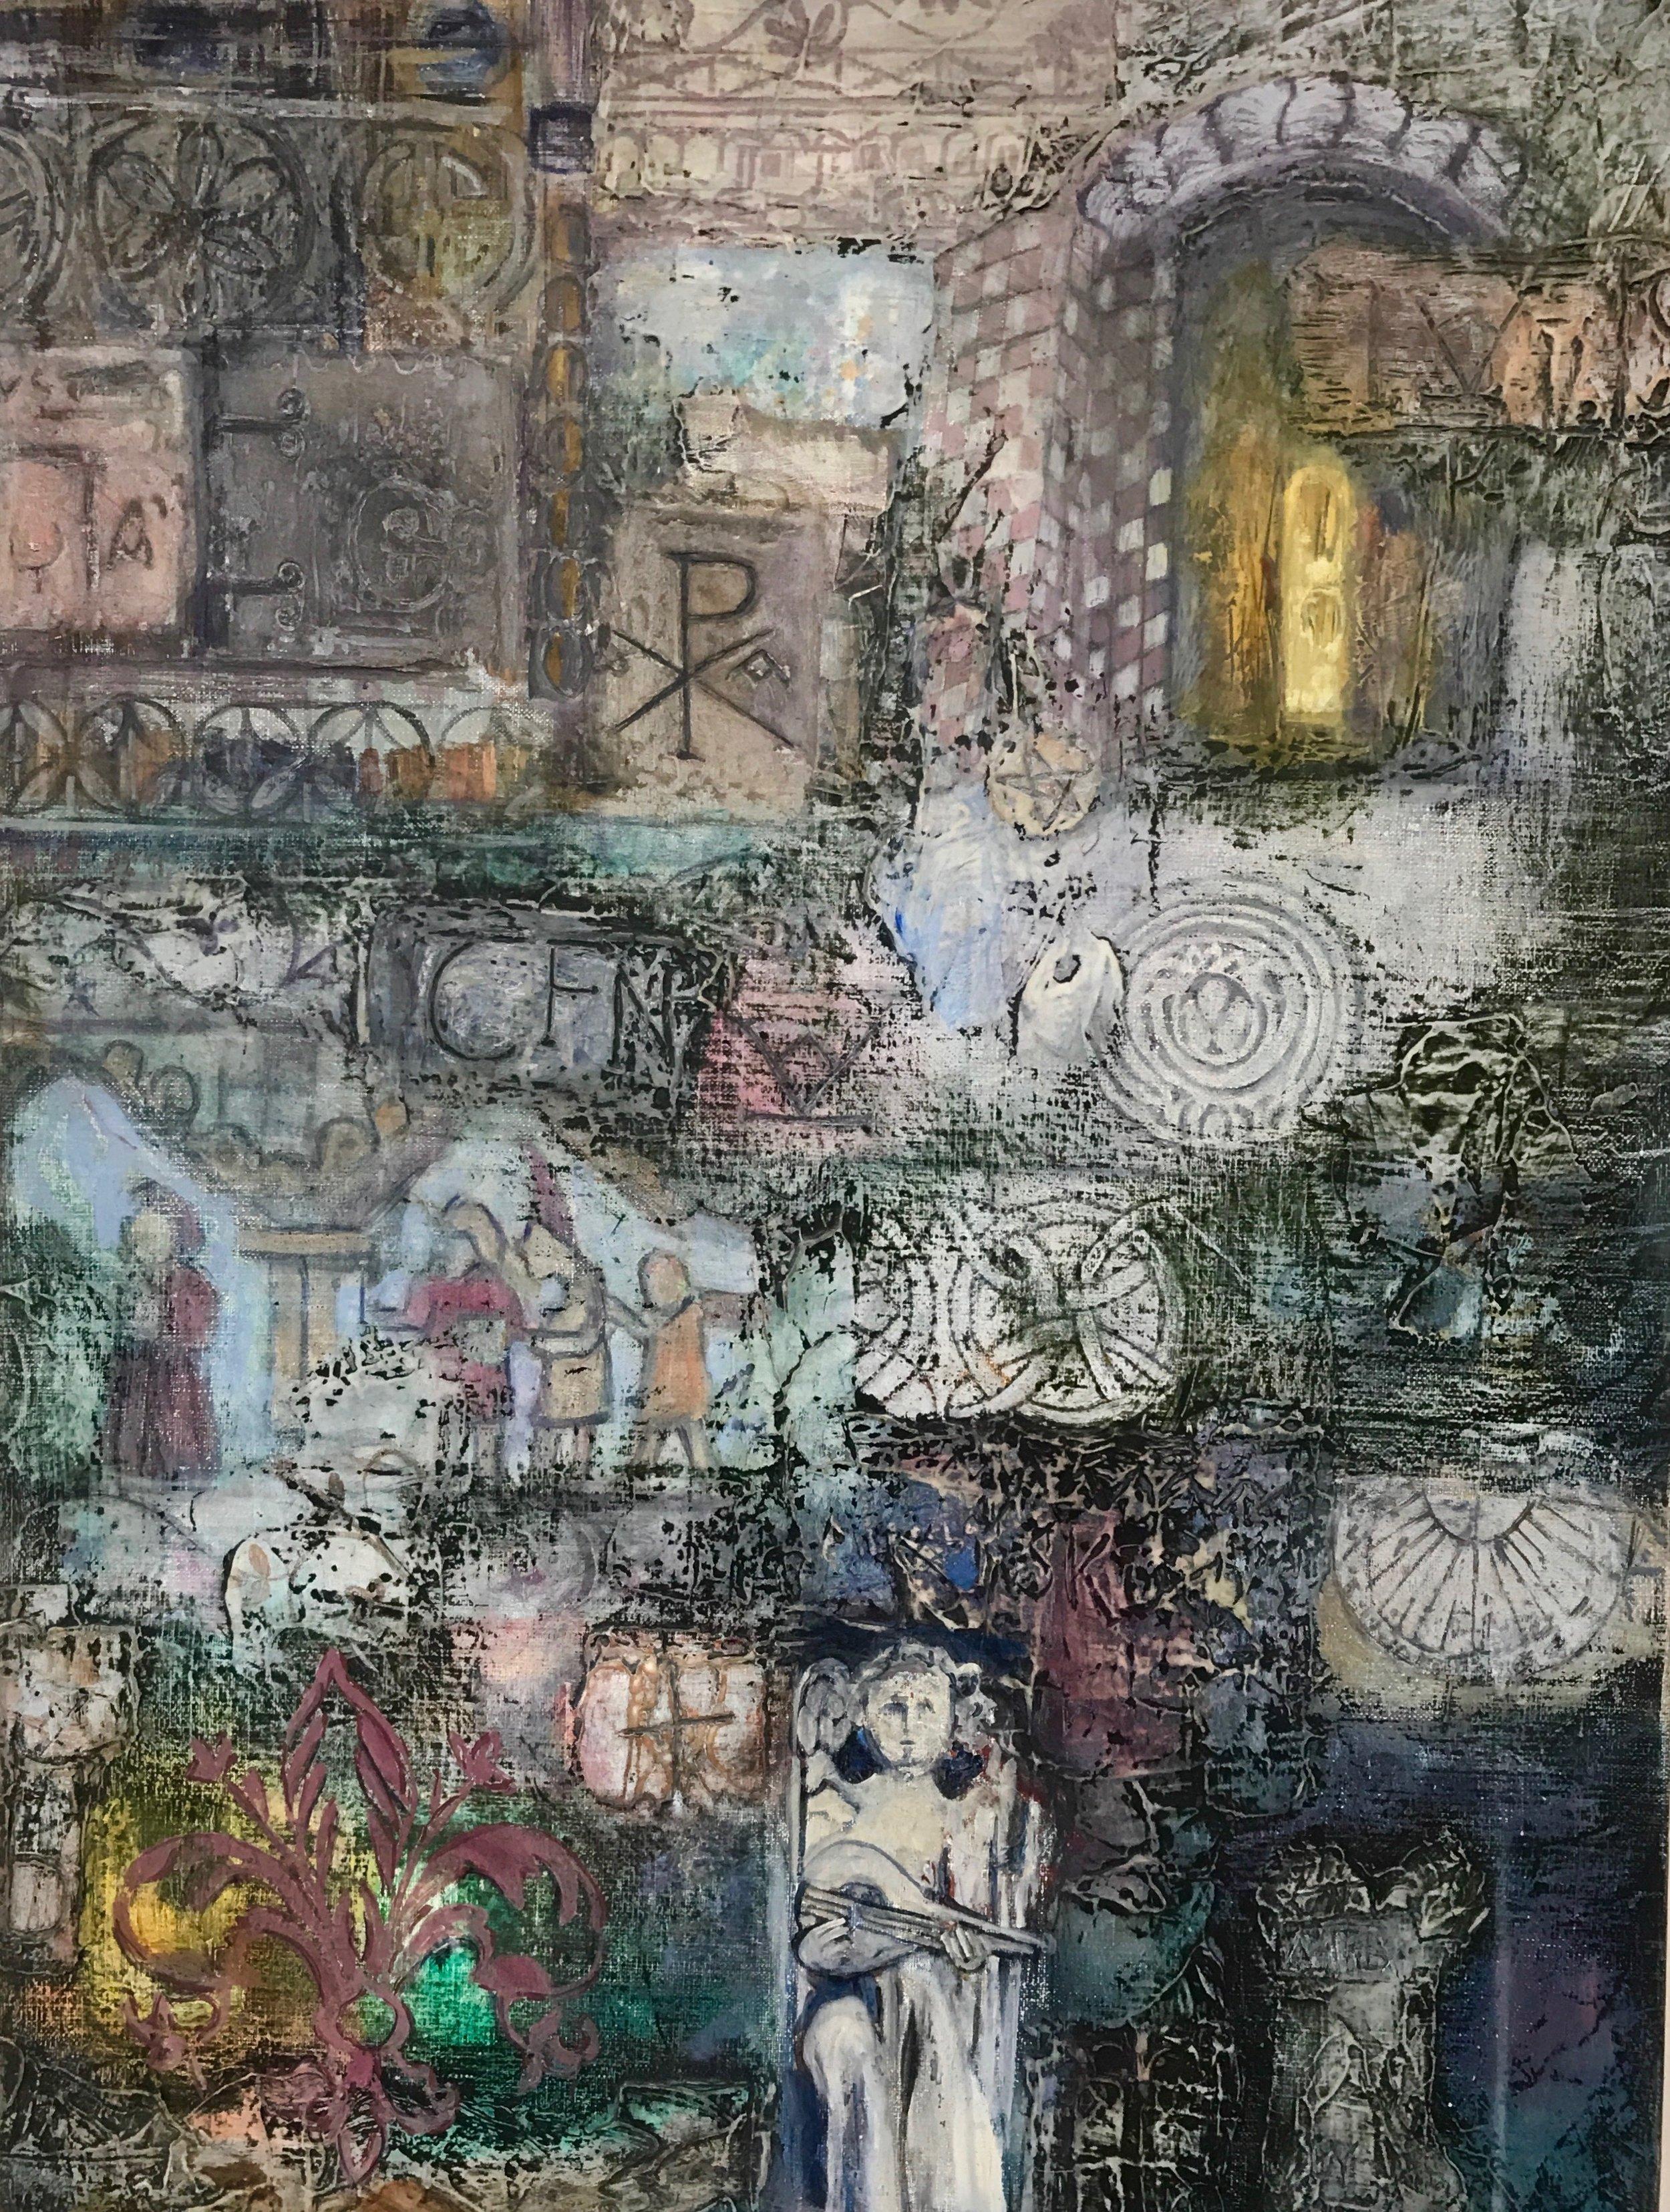 Wendy Castleden.stories in stone 2018 mixed media on canvas 60x45cmjpg.jpg